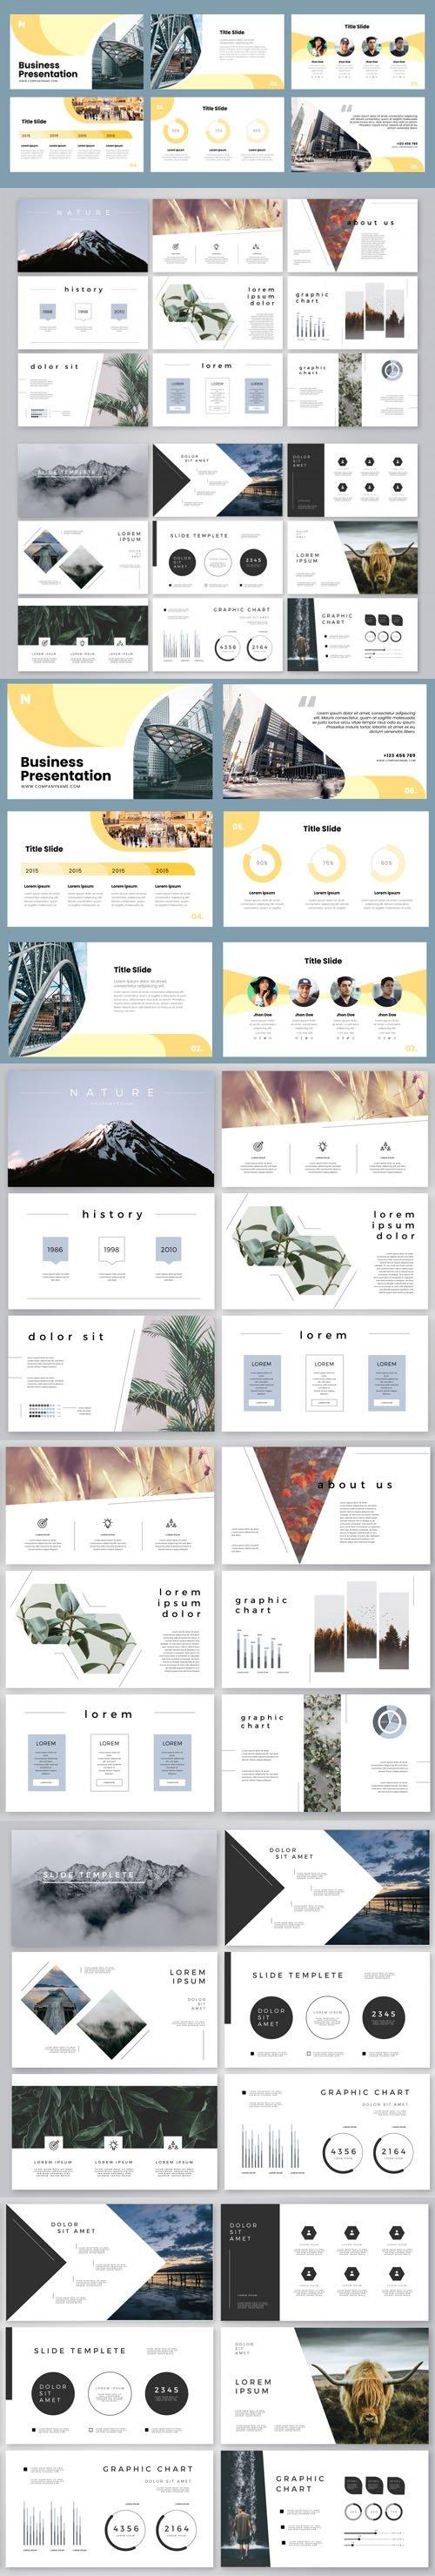 24 Business Presentation Slides Vectors Templates